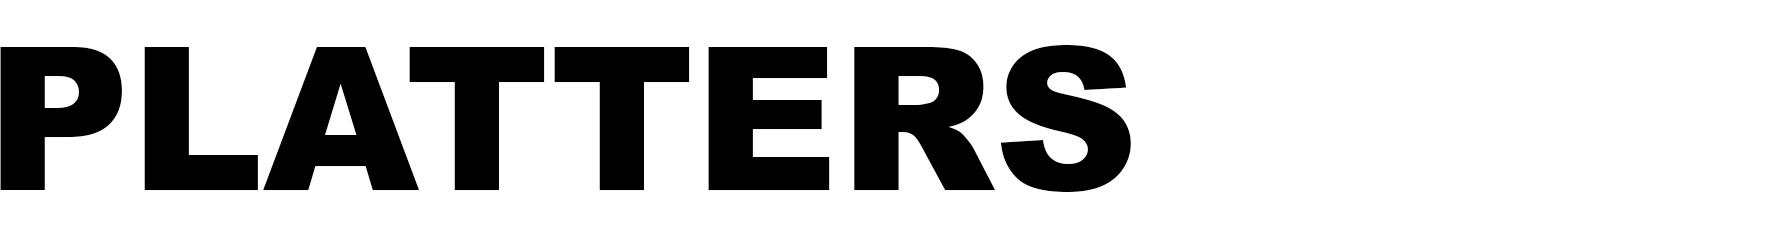 titlePlatters.jpg